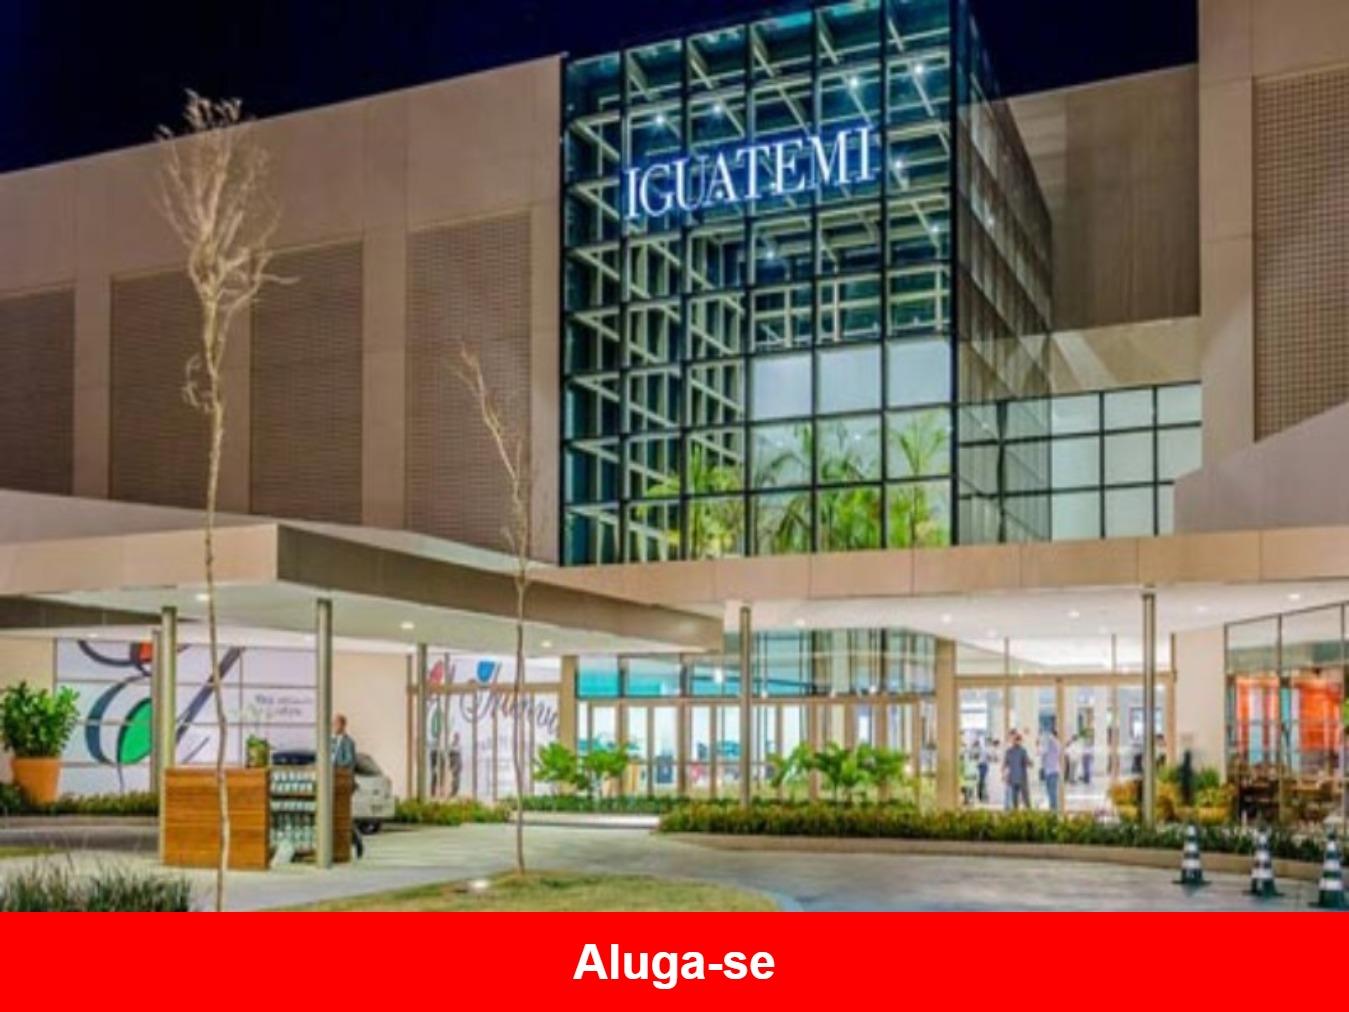 Aluga-se Sala Comercial no Shopping Iguatemi, Sorocaba  - SP